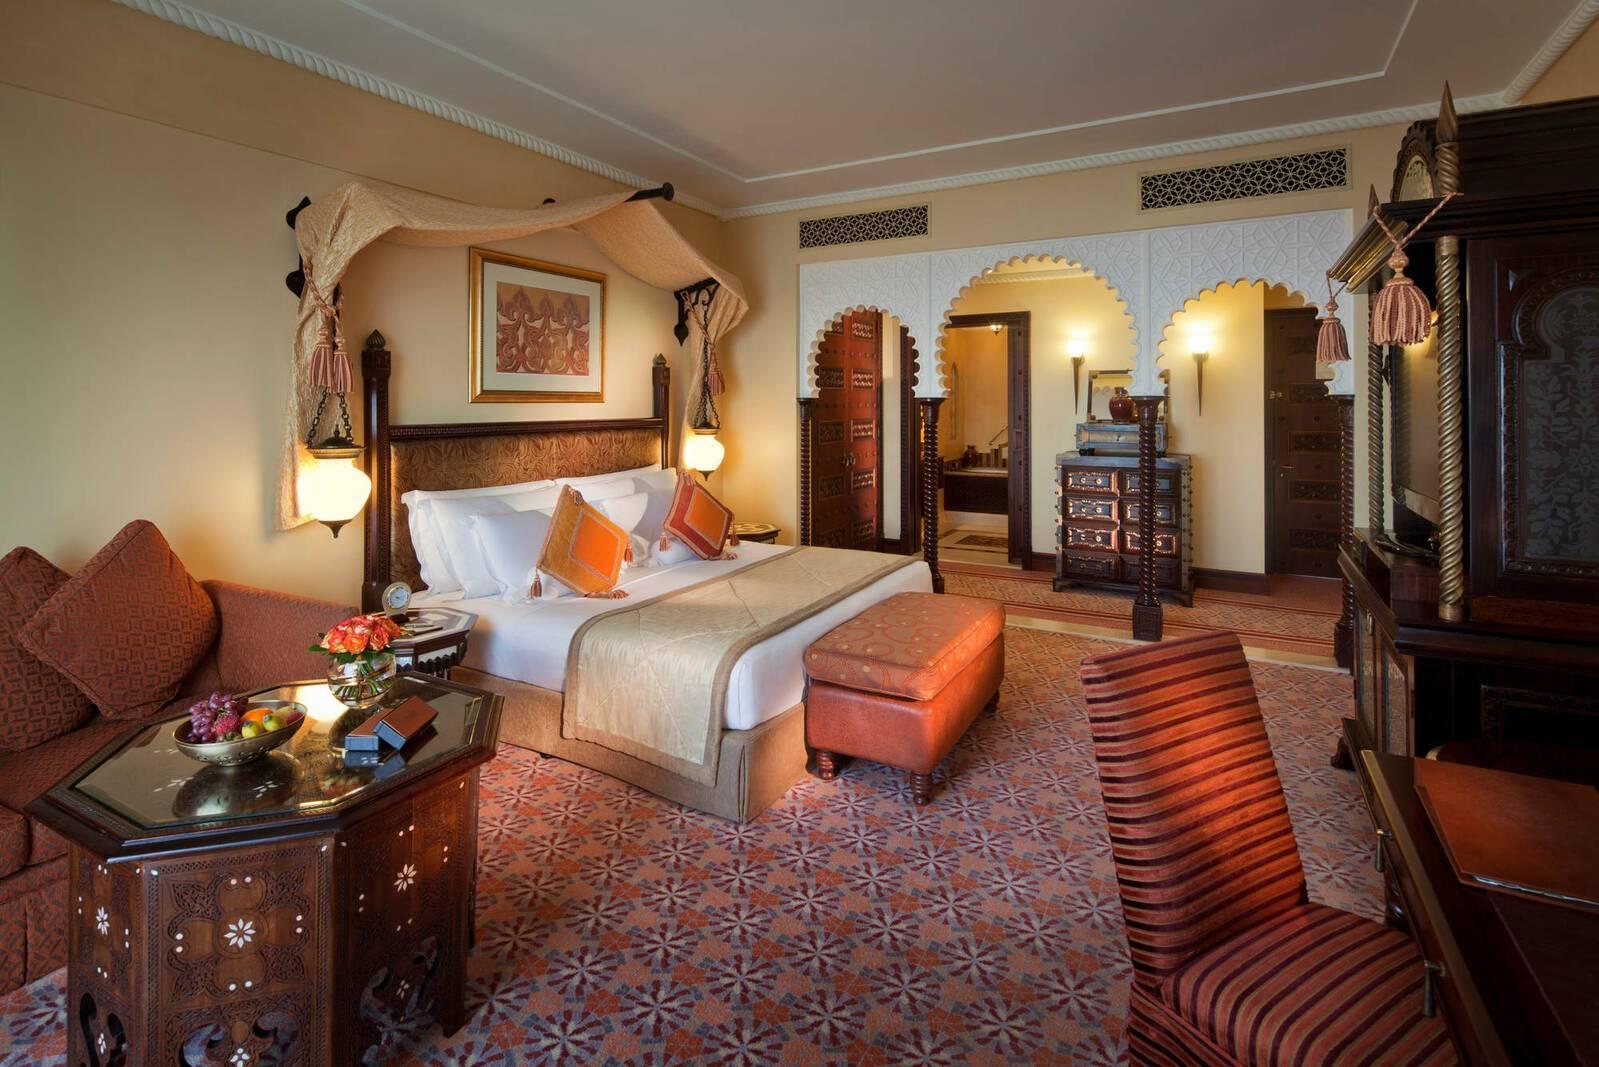 Jumeirah al Qasr Dubai ocean deluxe room chambre